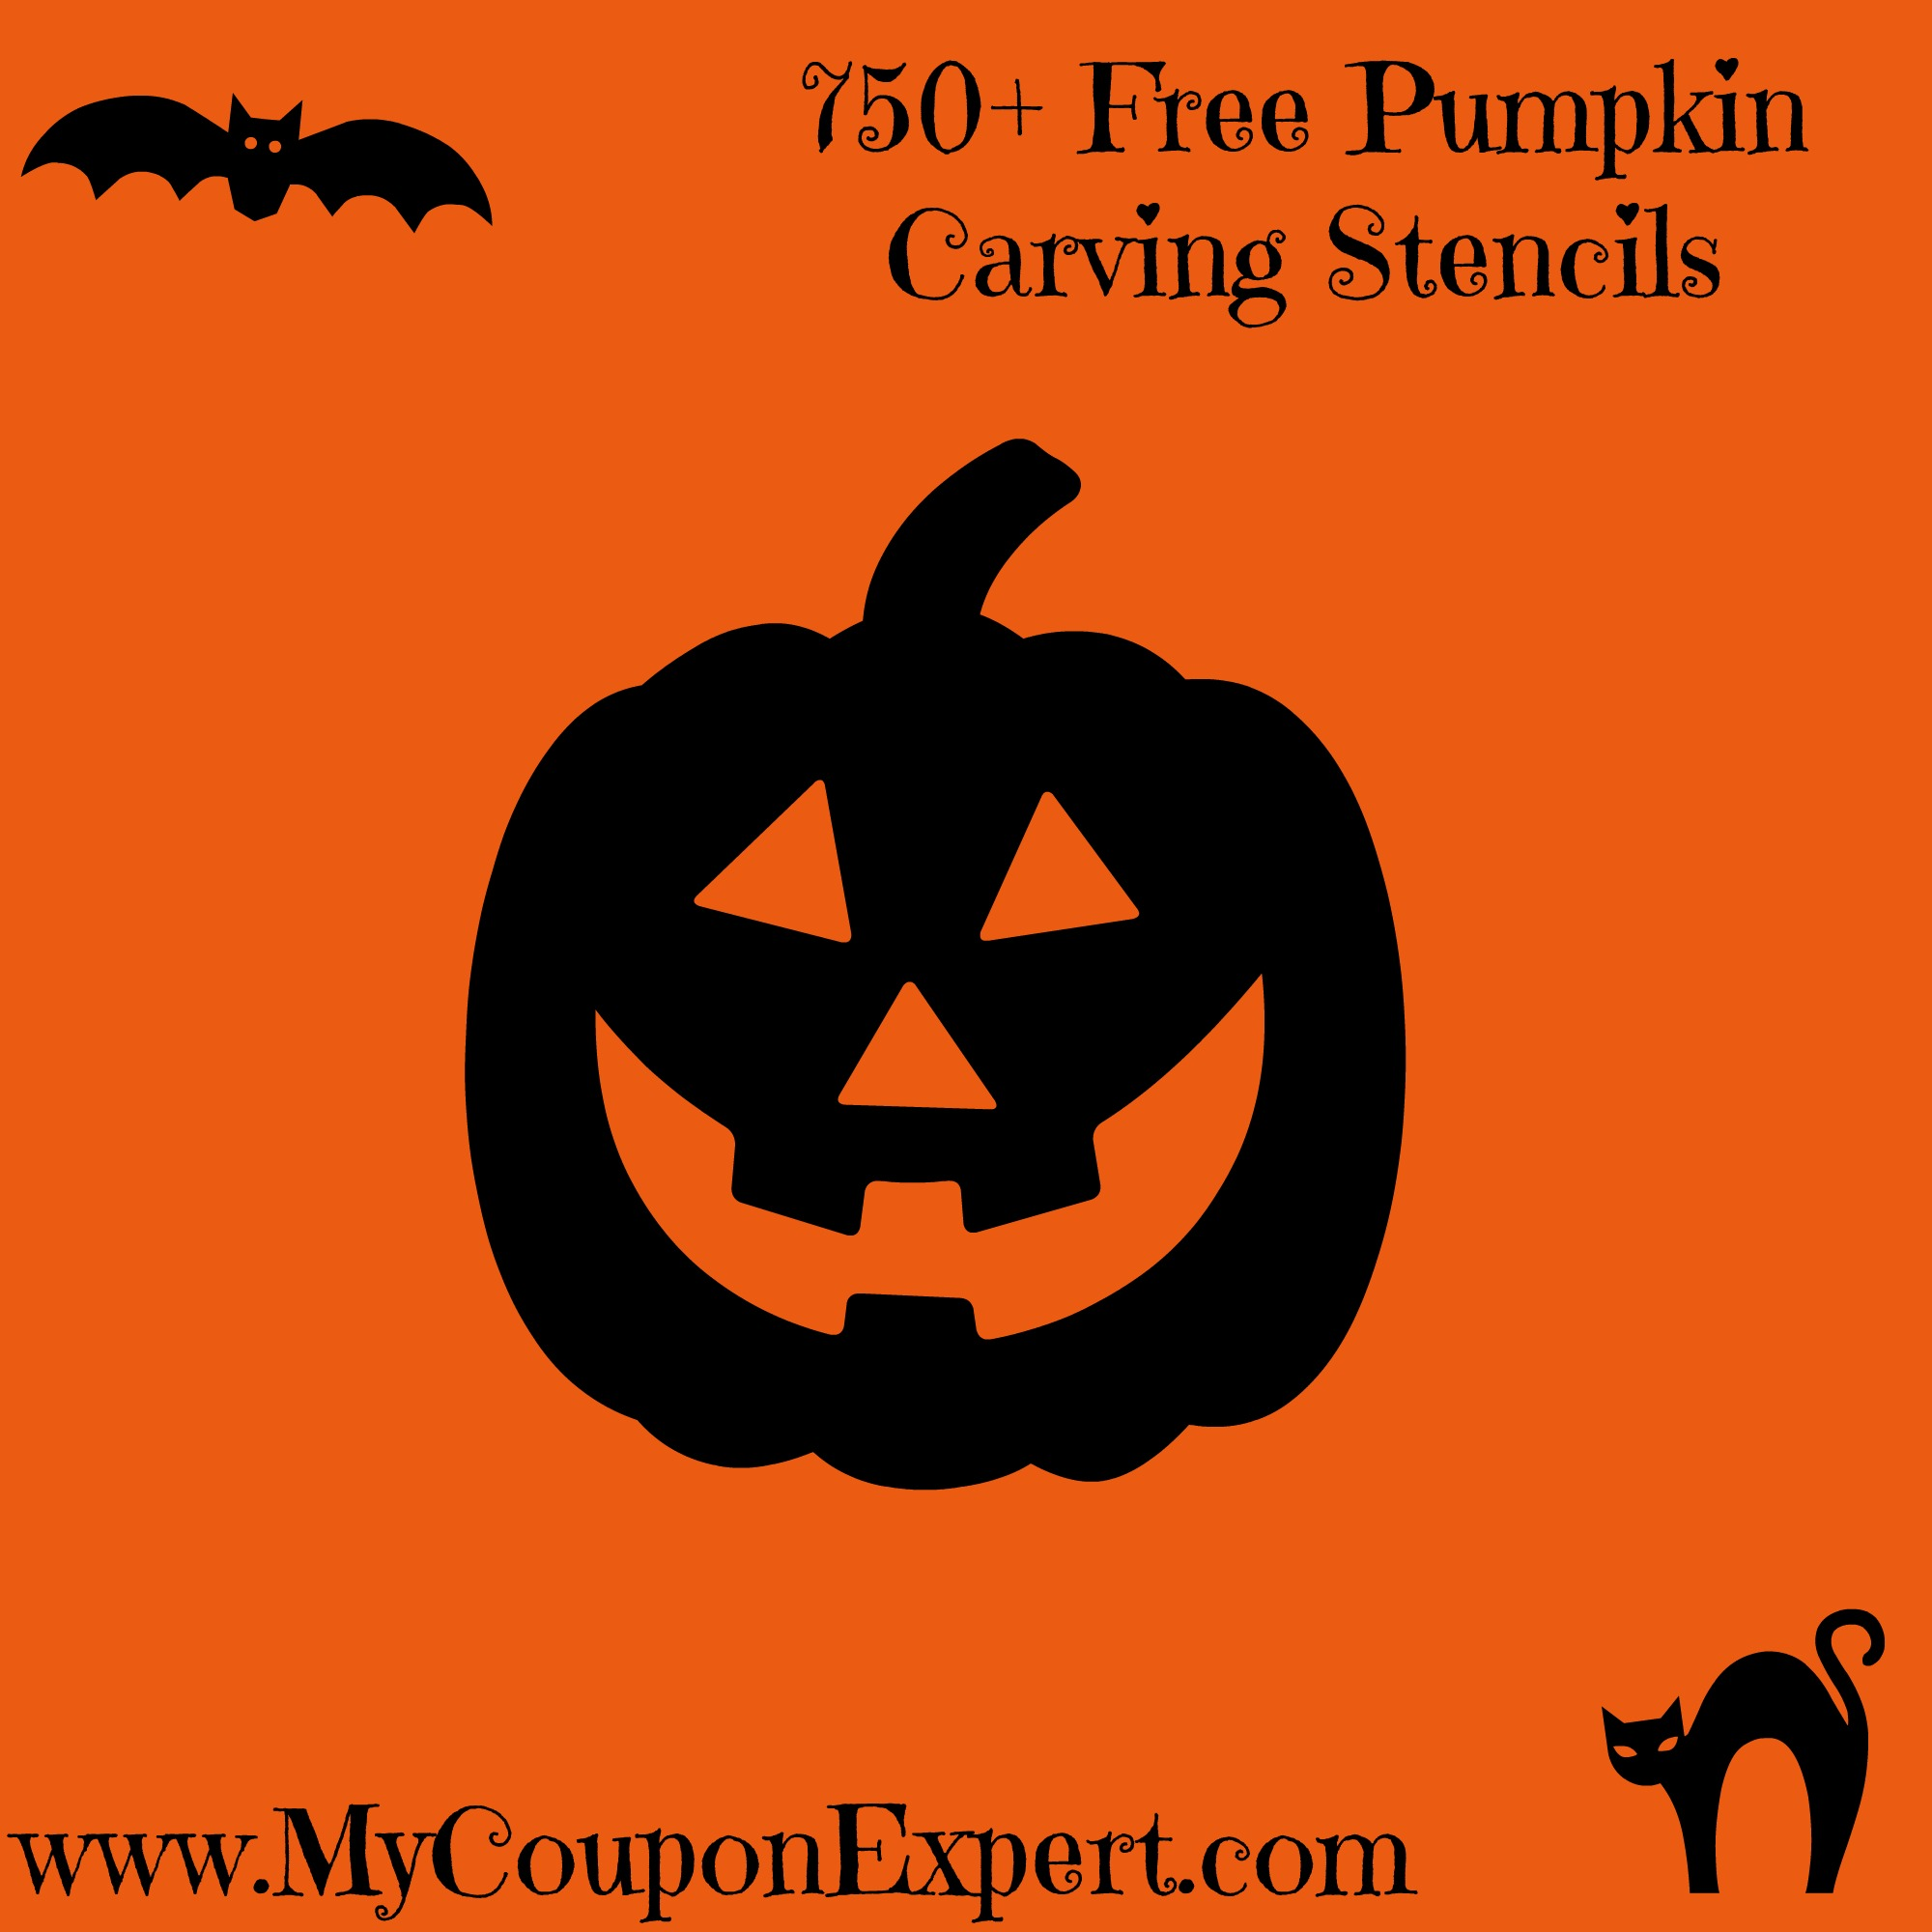 750+ Free Pumpkin Carving Stencils ·